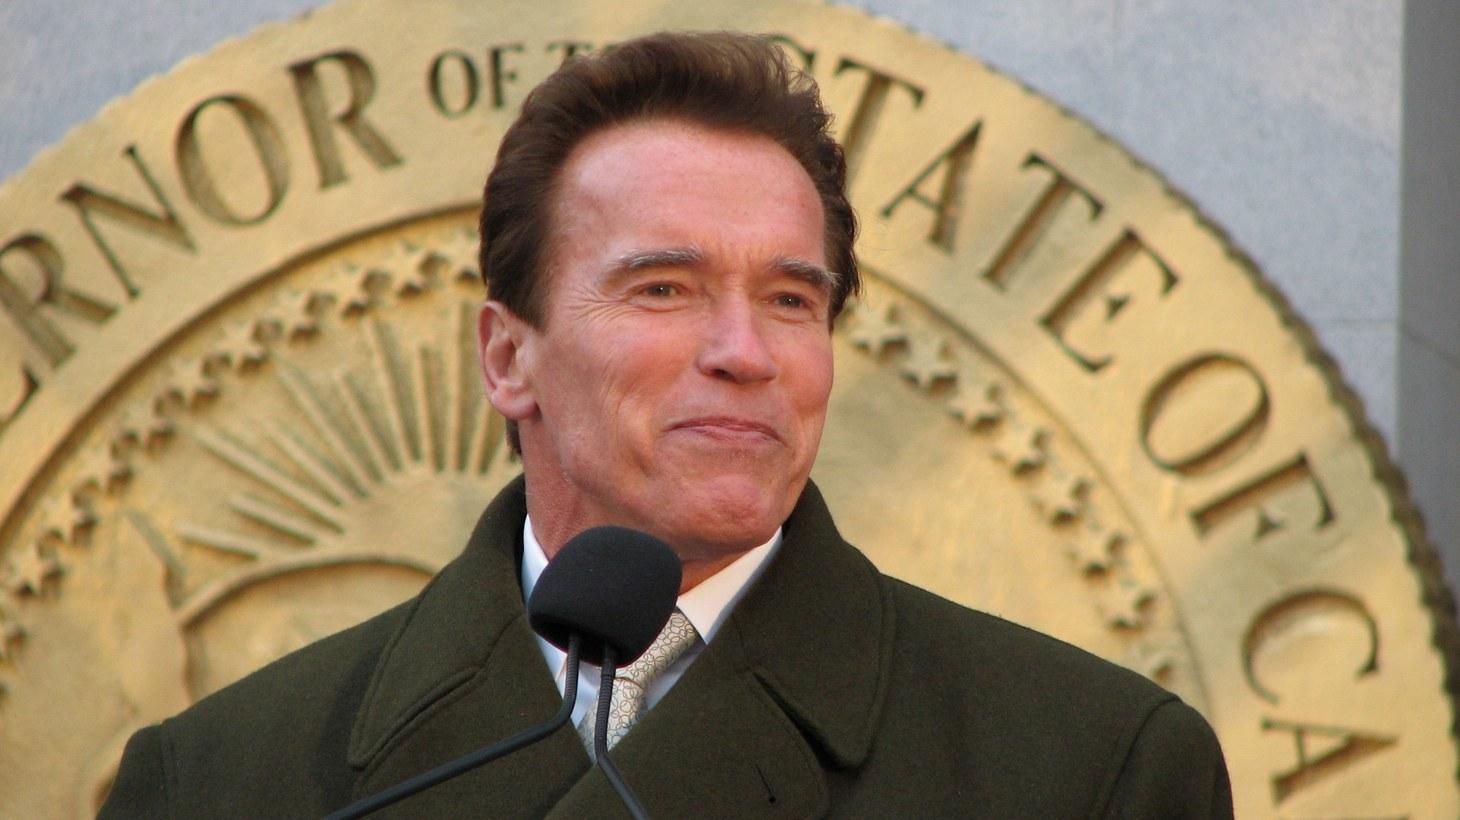 Arnold Schwarzenegger speaking at the lighting of the menorah at the California capitol building in Sacramento, 2012.